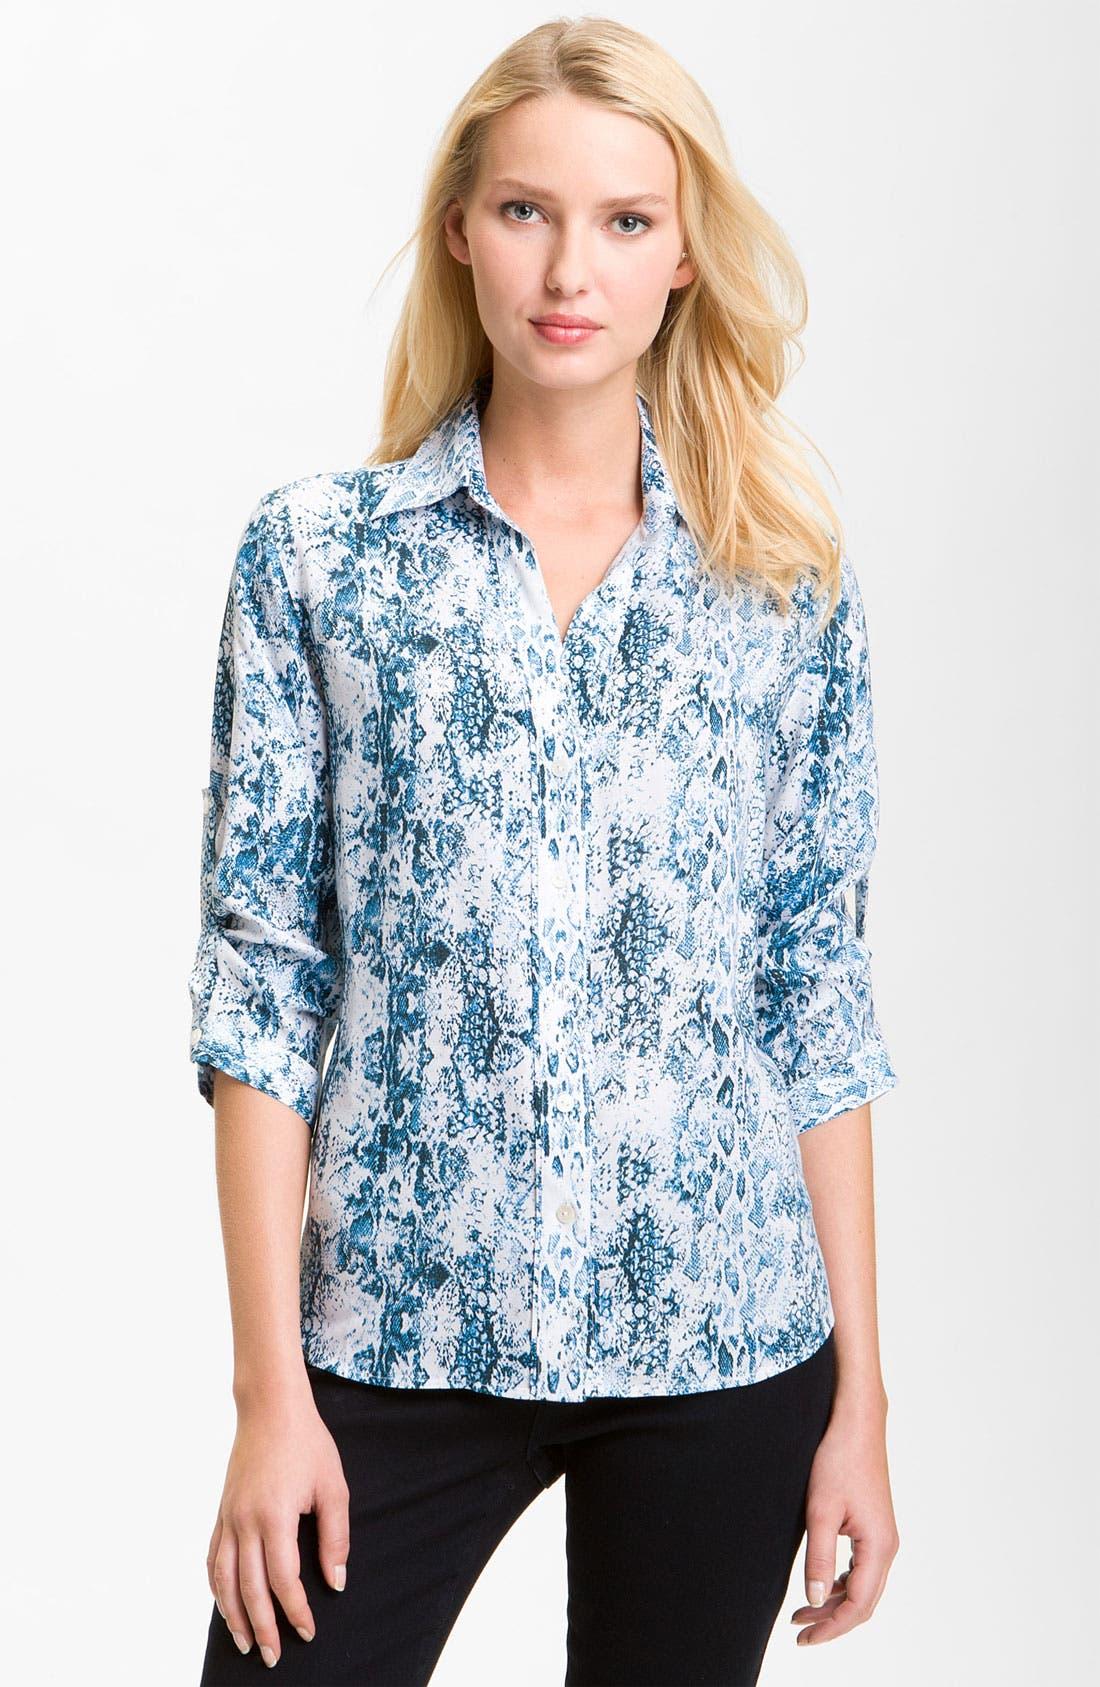 Alternate Image 1 Selected - Foxcroft Python Print Shirt (Petite)